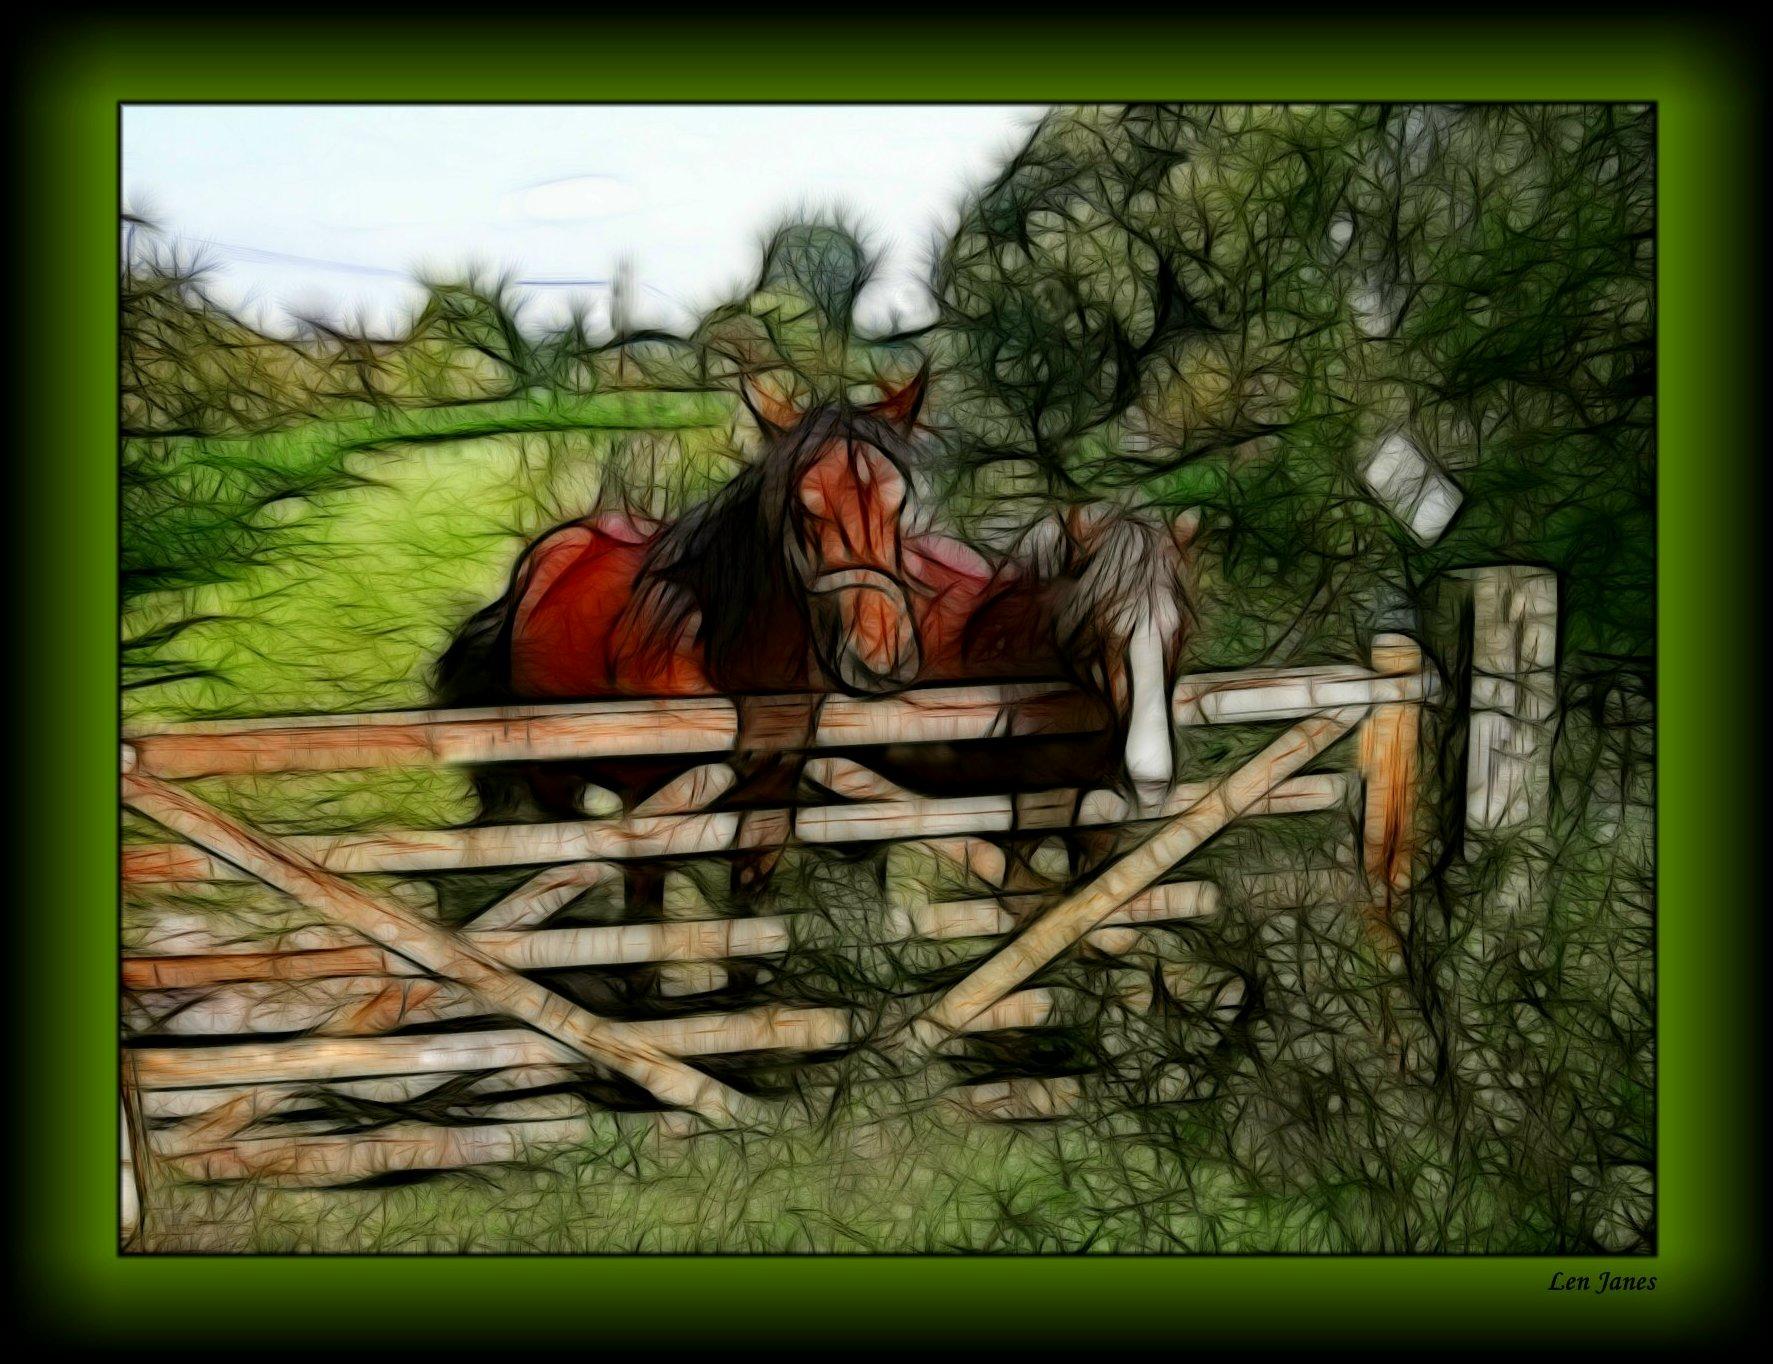 hintergrundbilder meer wasser natur rot pferd winter feld haus gr n br cke braun. Black Bedroom Furniture Sets. Home Design Ideas